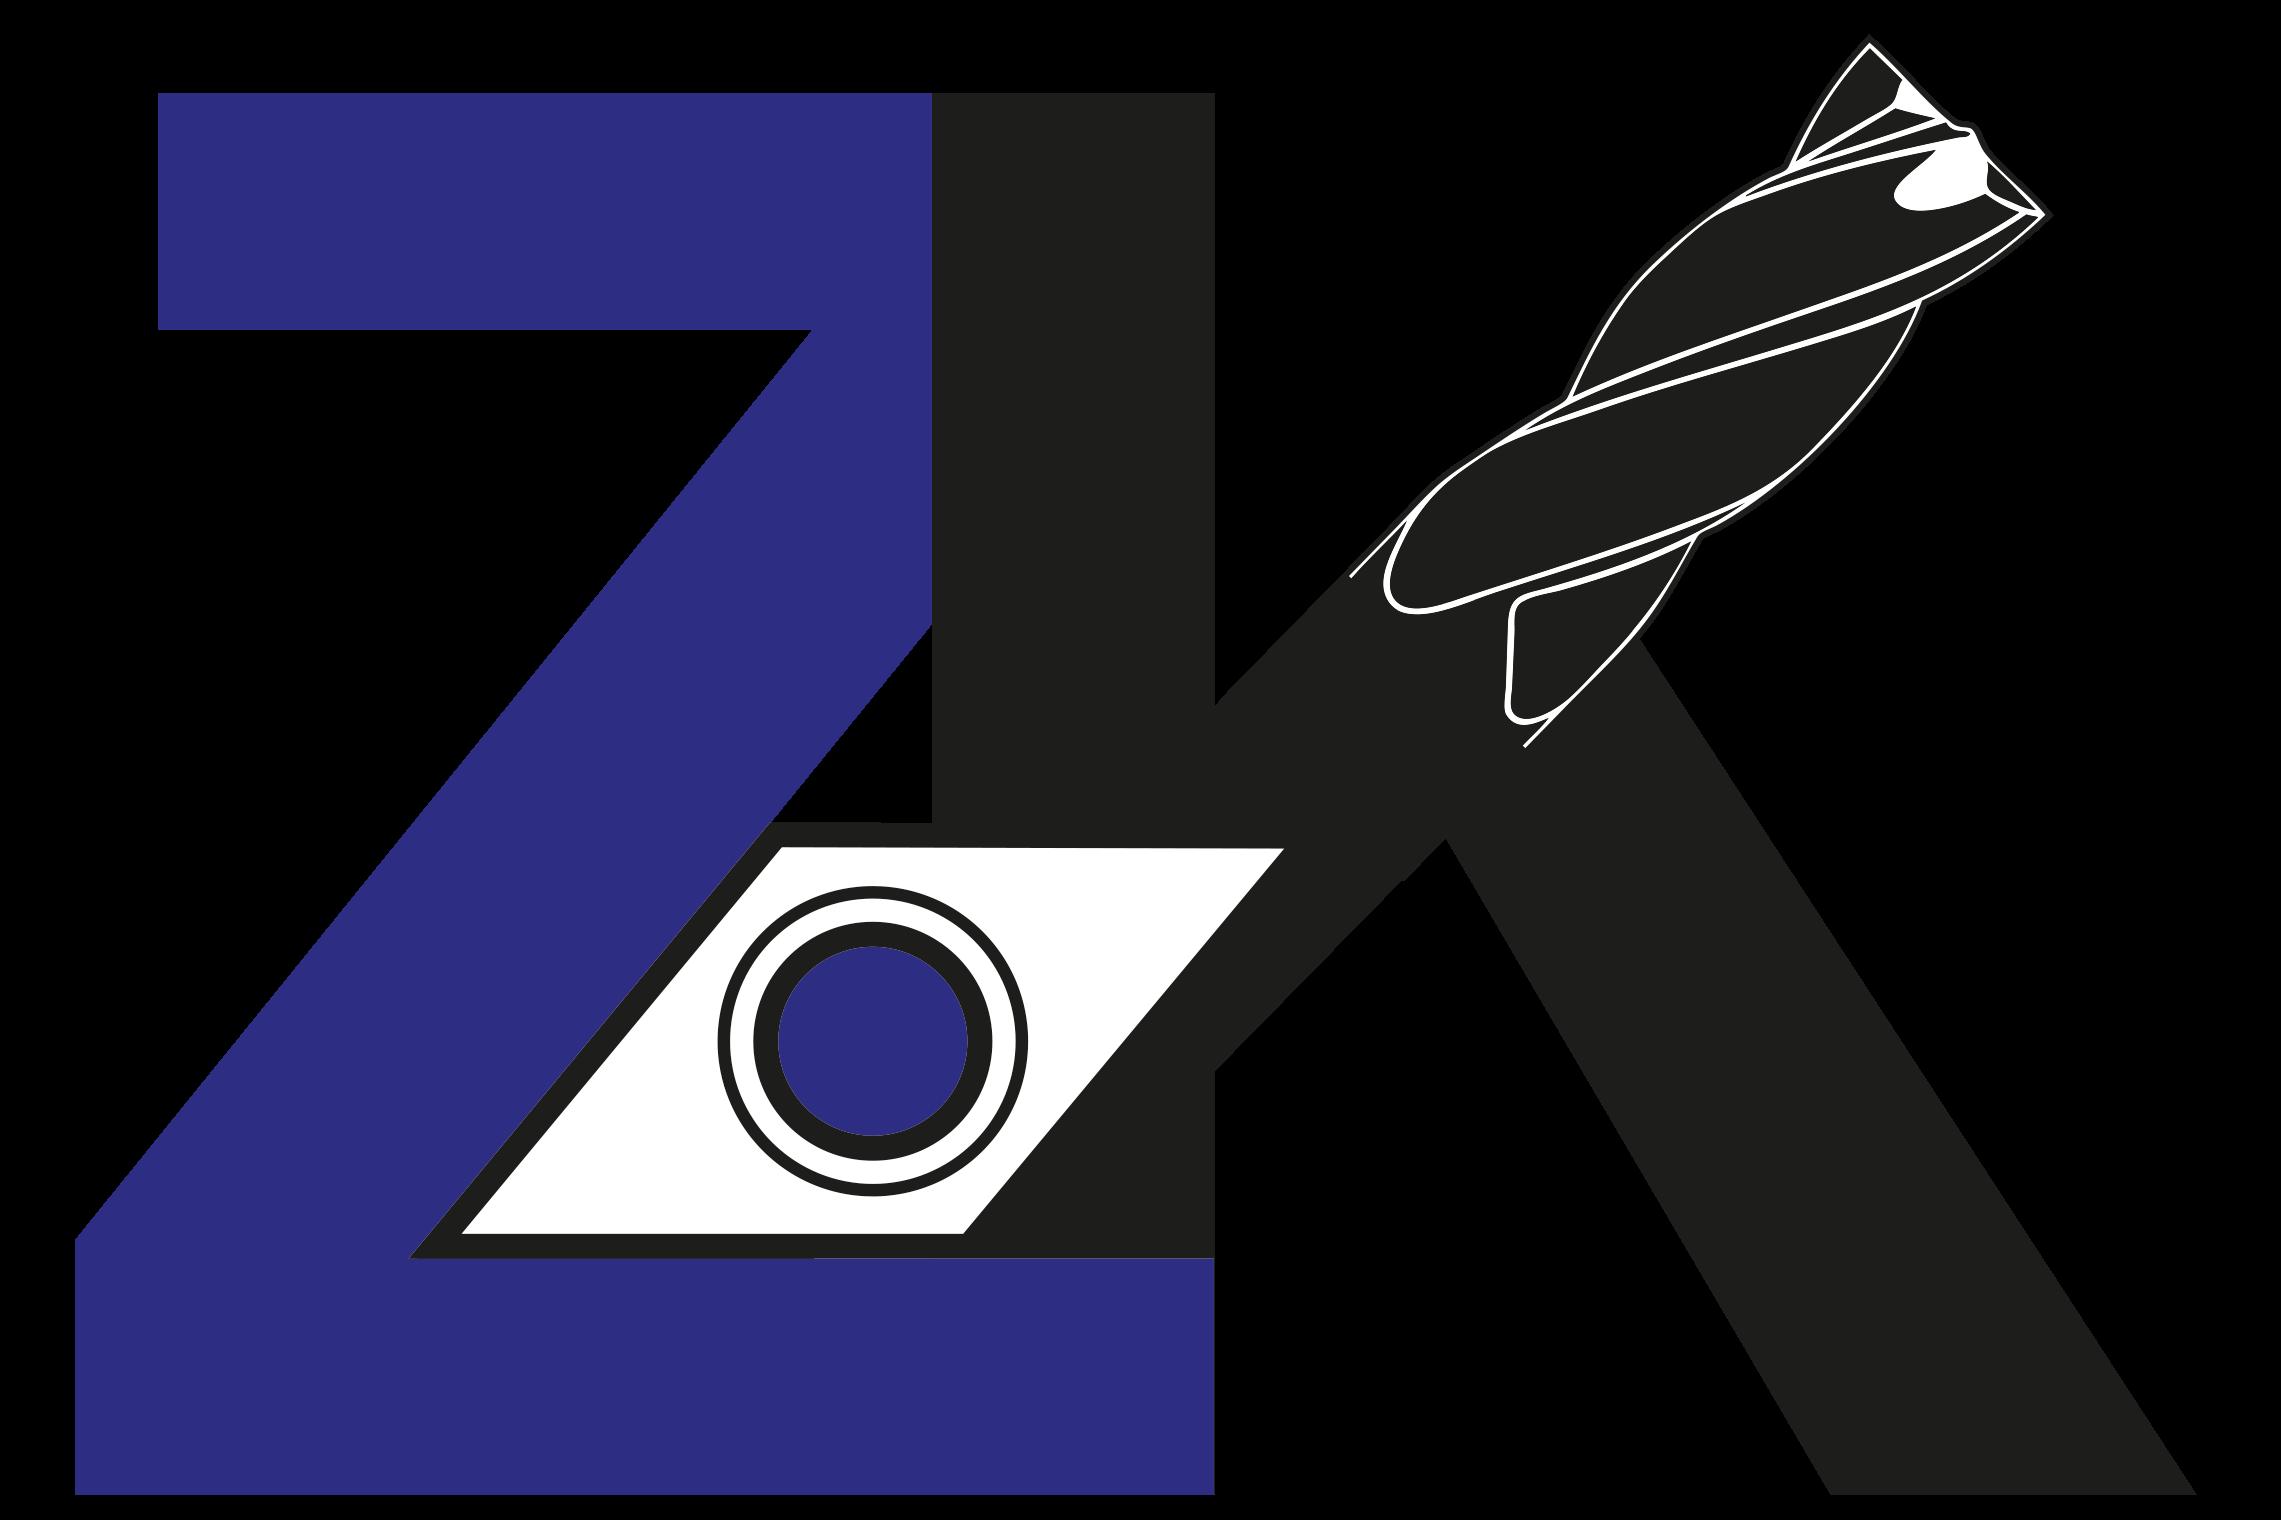 ZK Zerspanungstechnologie Logo